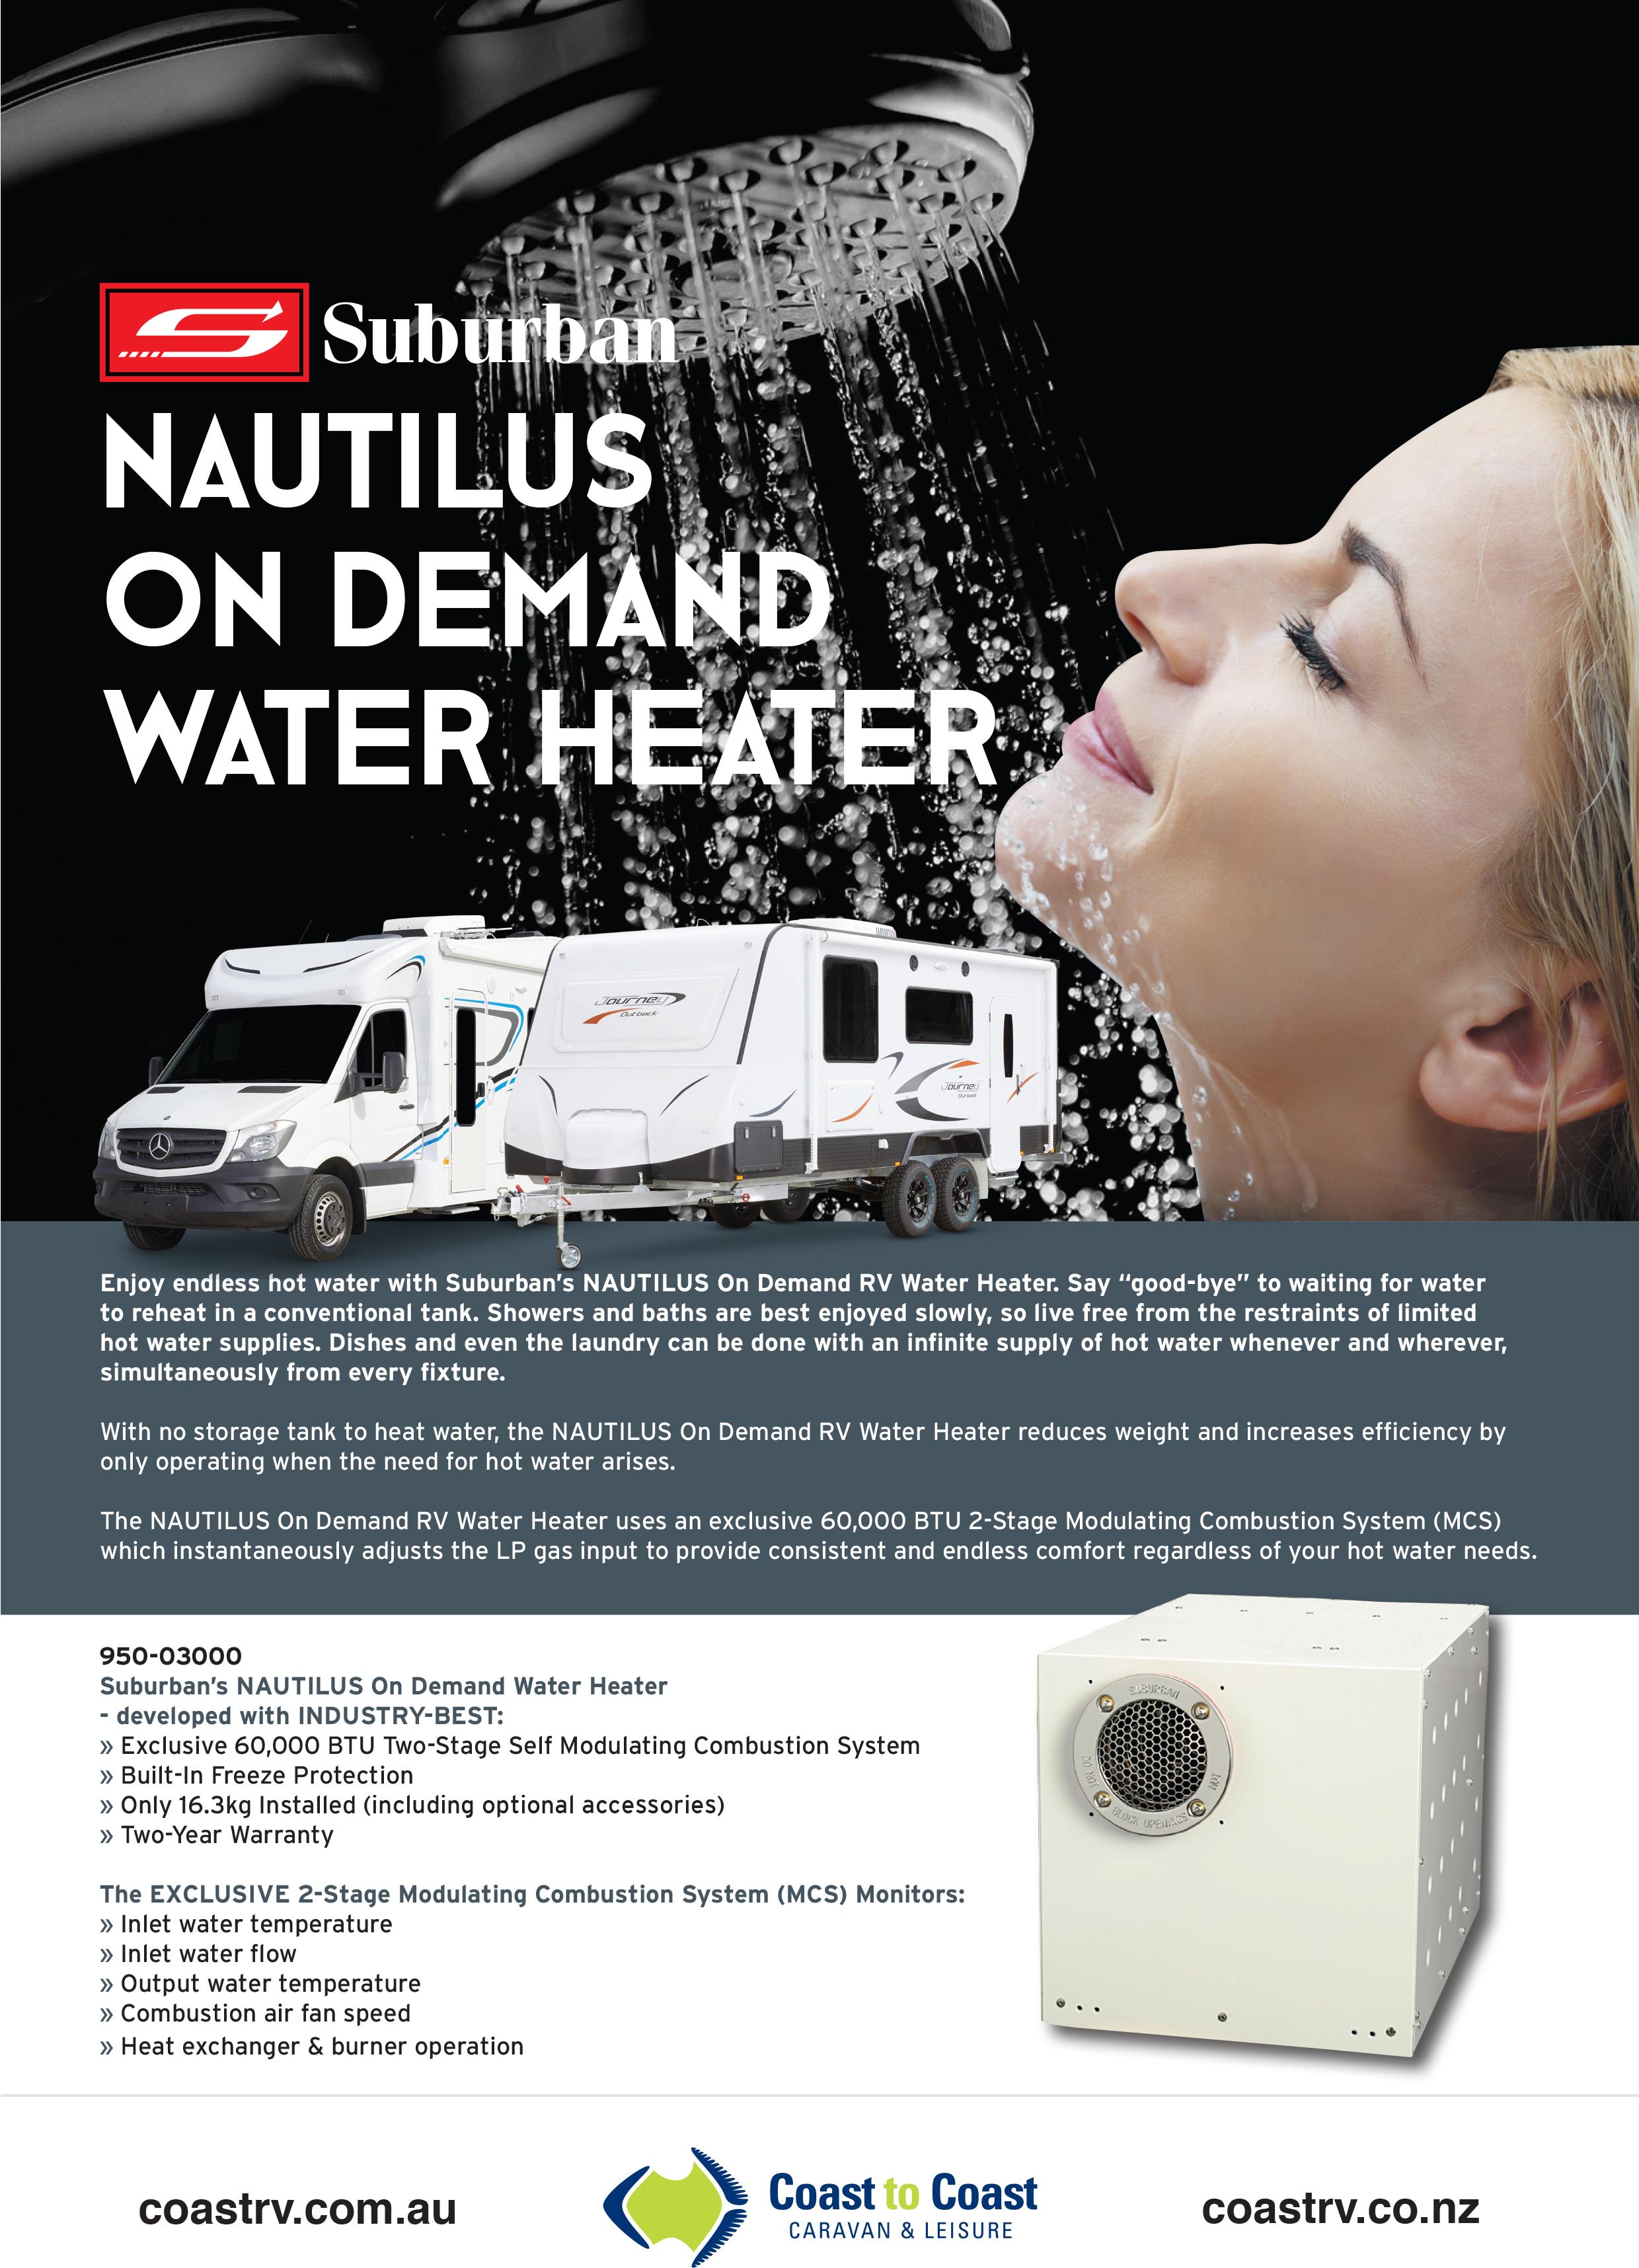 Suburban Nautilus On Demand Hot Water Heater